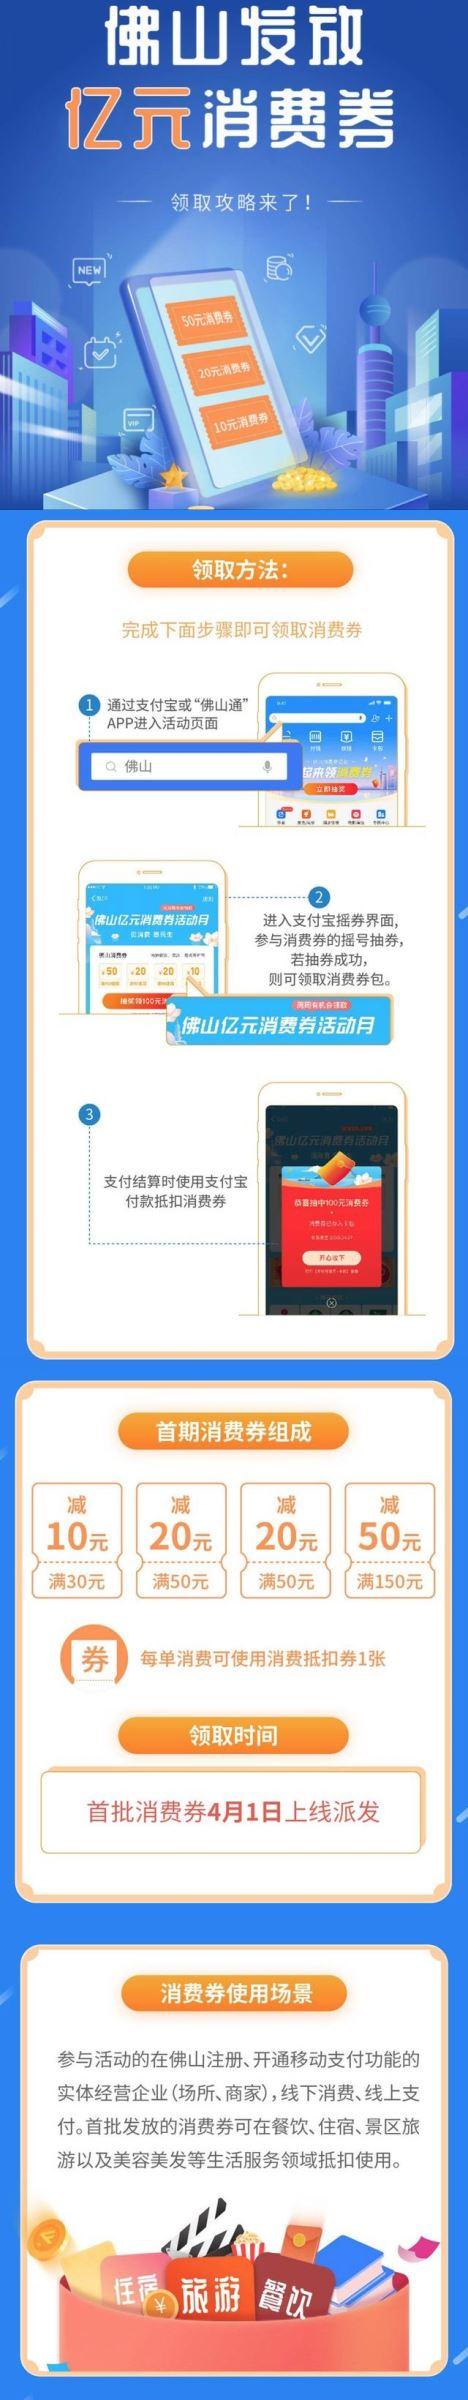 http://www.110tao.com/xingyeguancha/241893.html